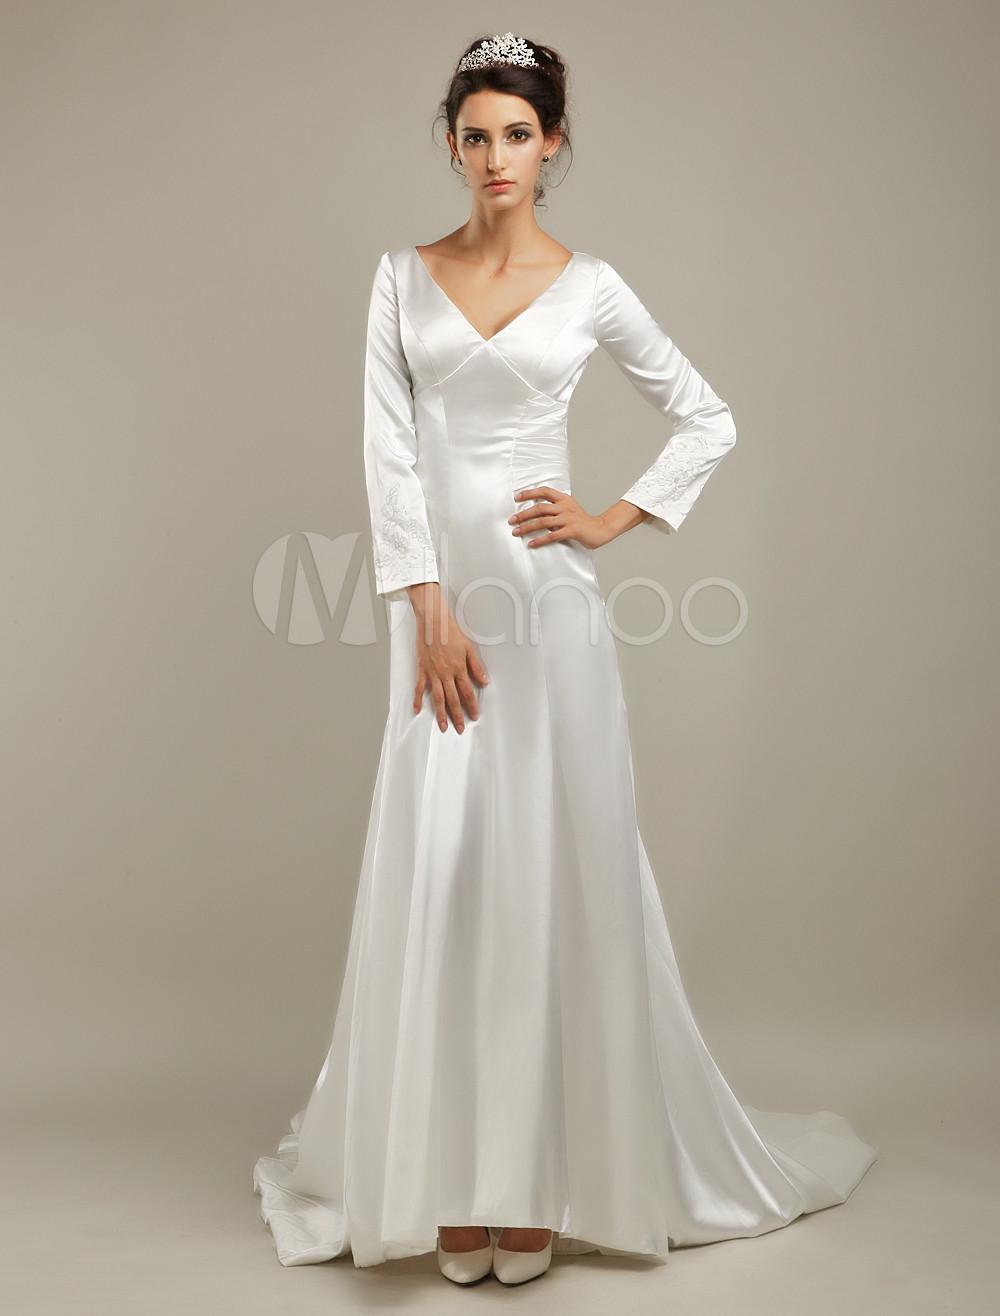 Court train ivory bridal wedding dress with v neck a line beading 30off junglespirit Images